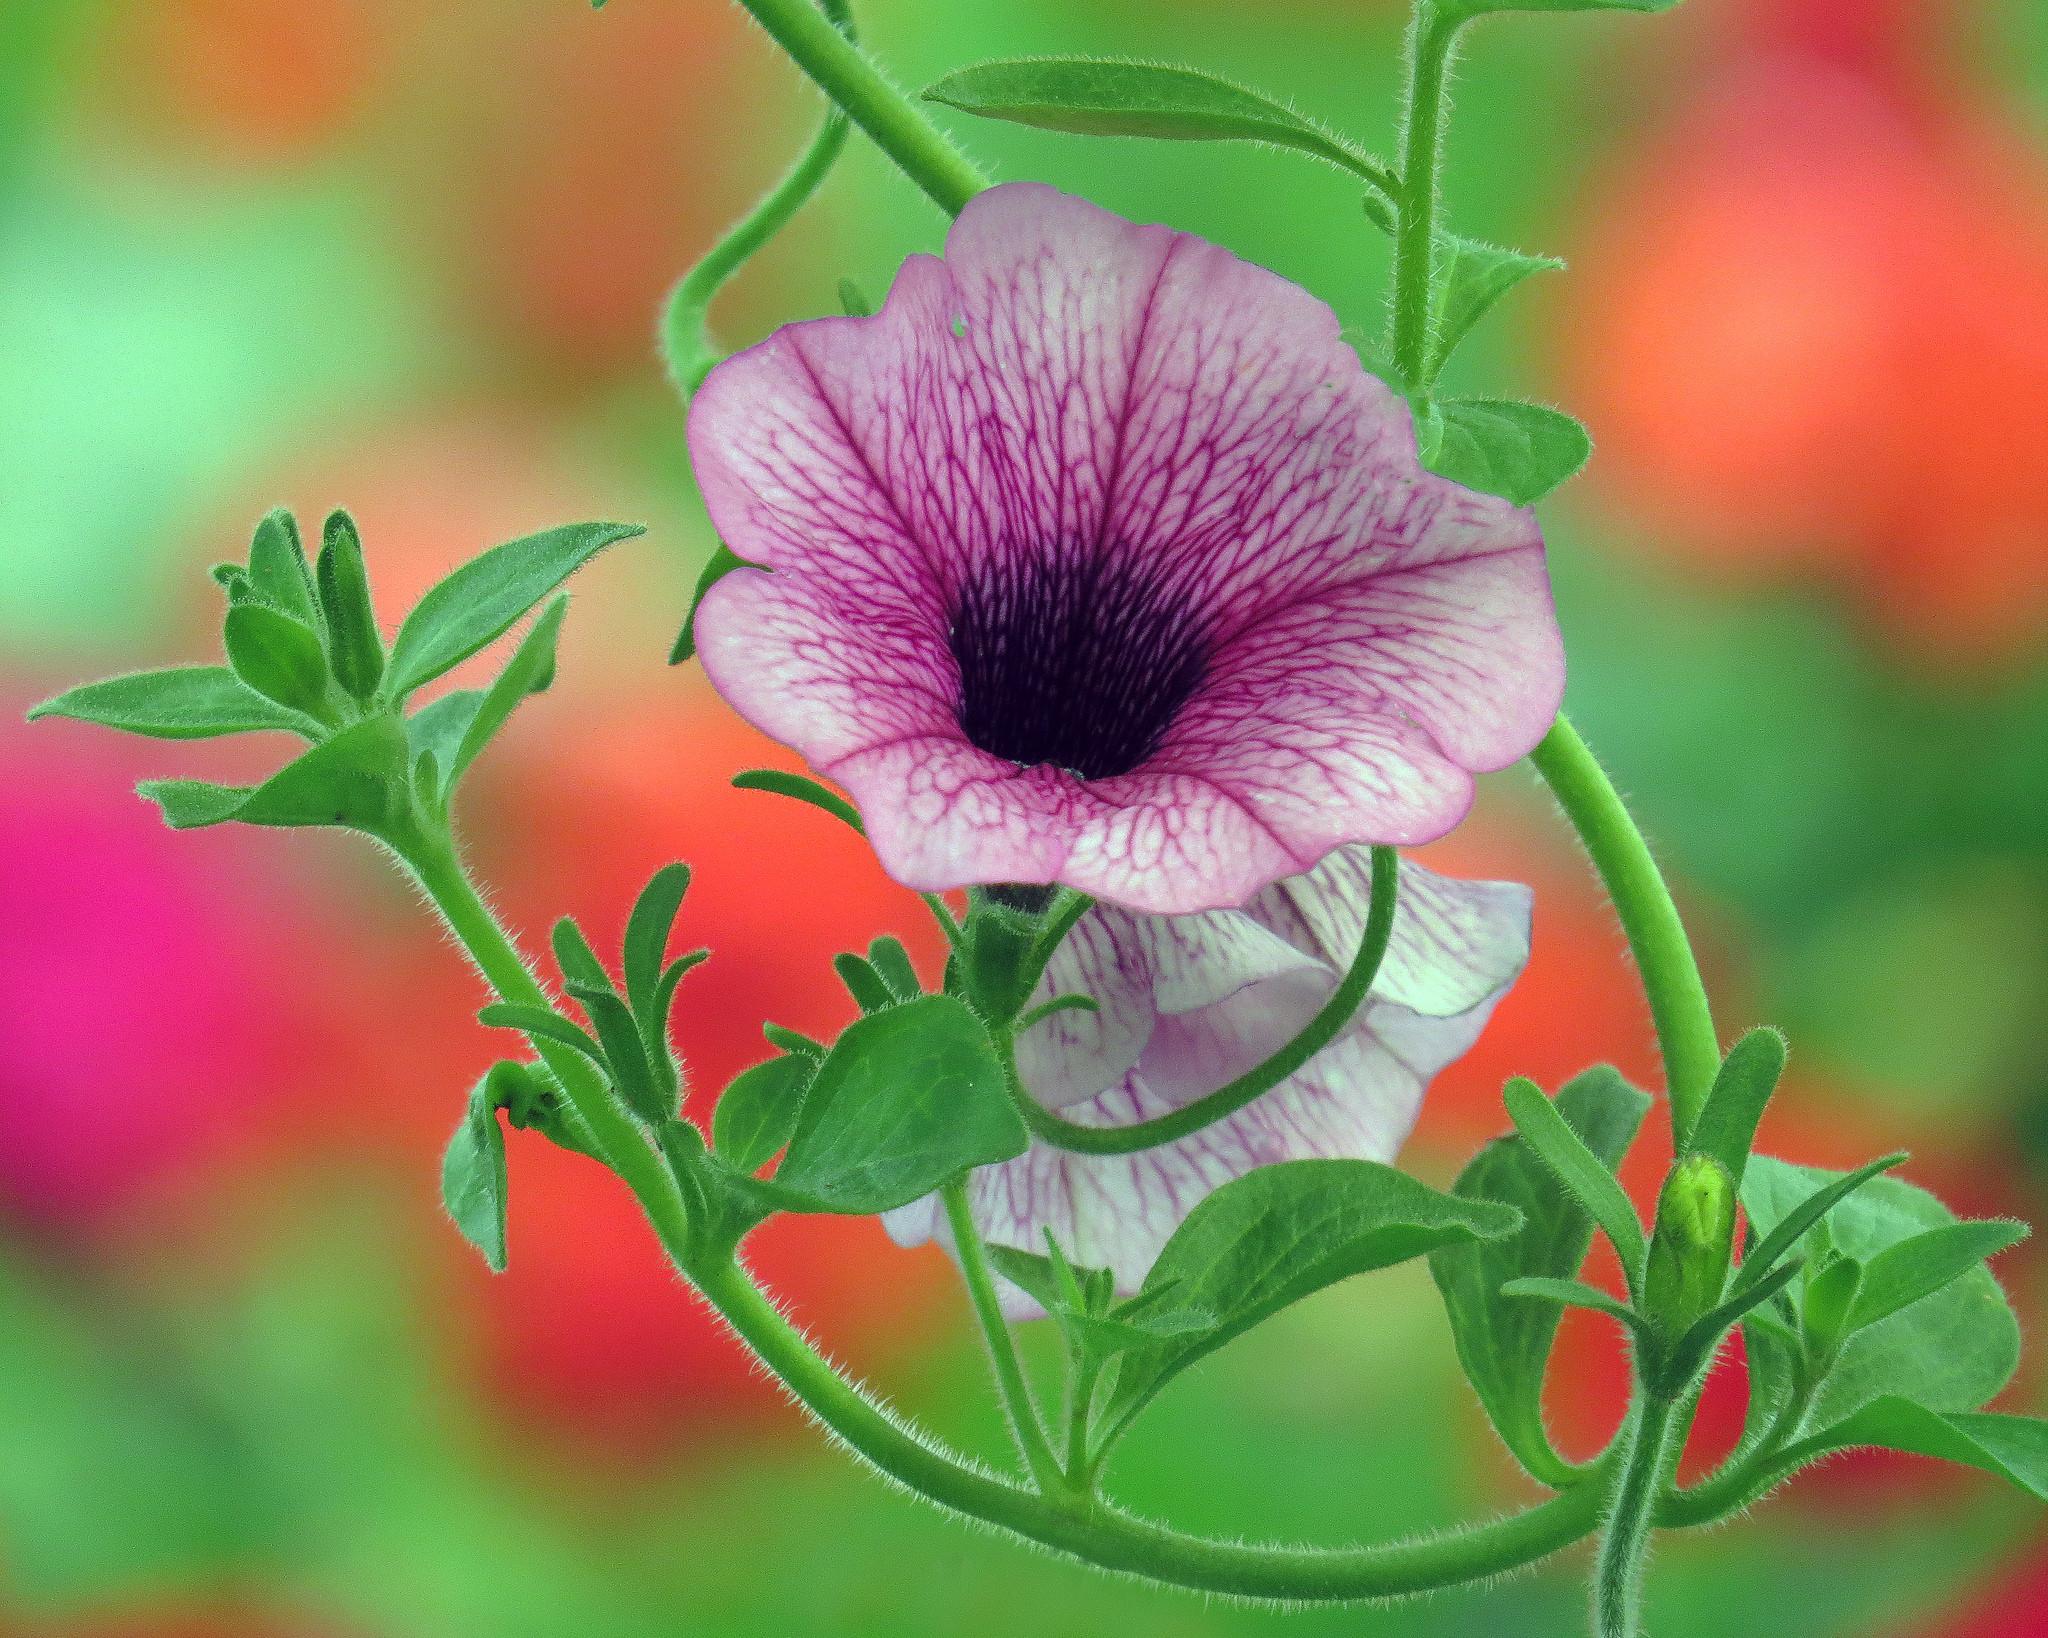 обои петуния, петунья, цветок, флора картинки фото